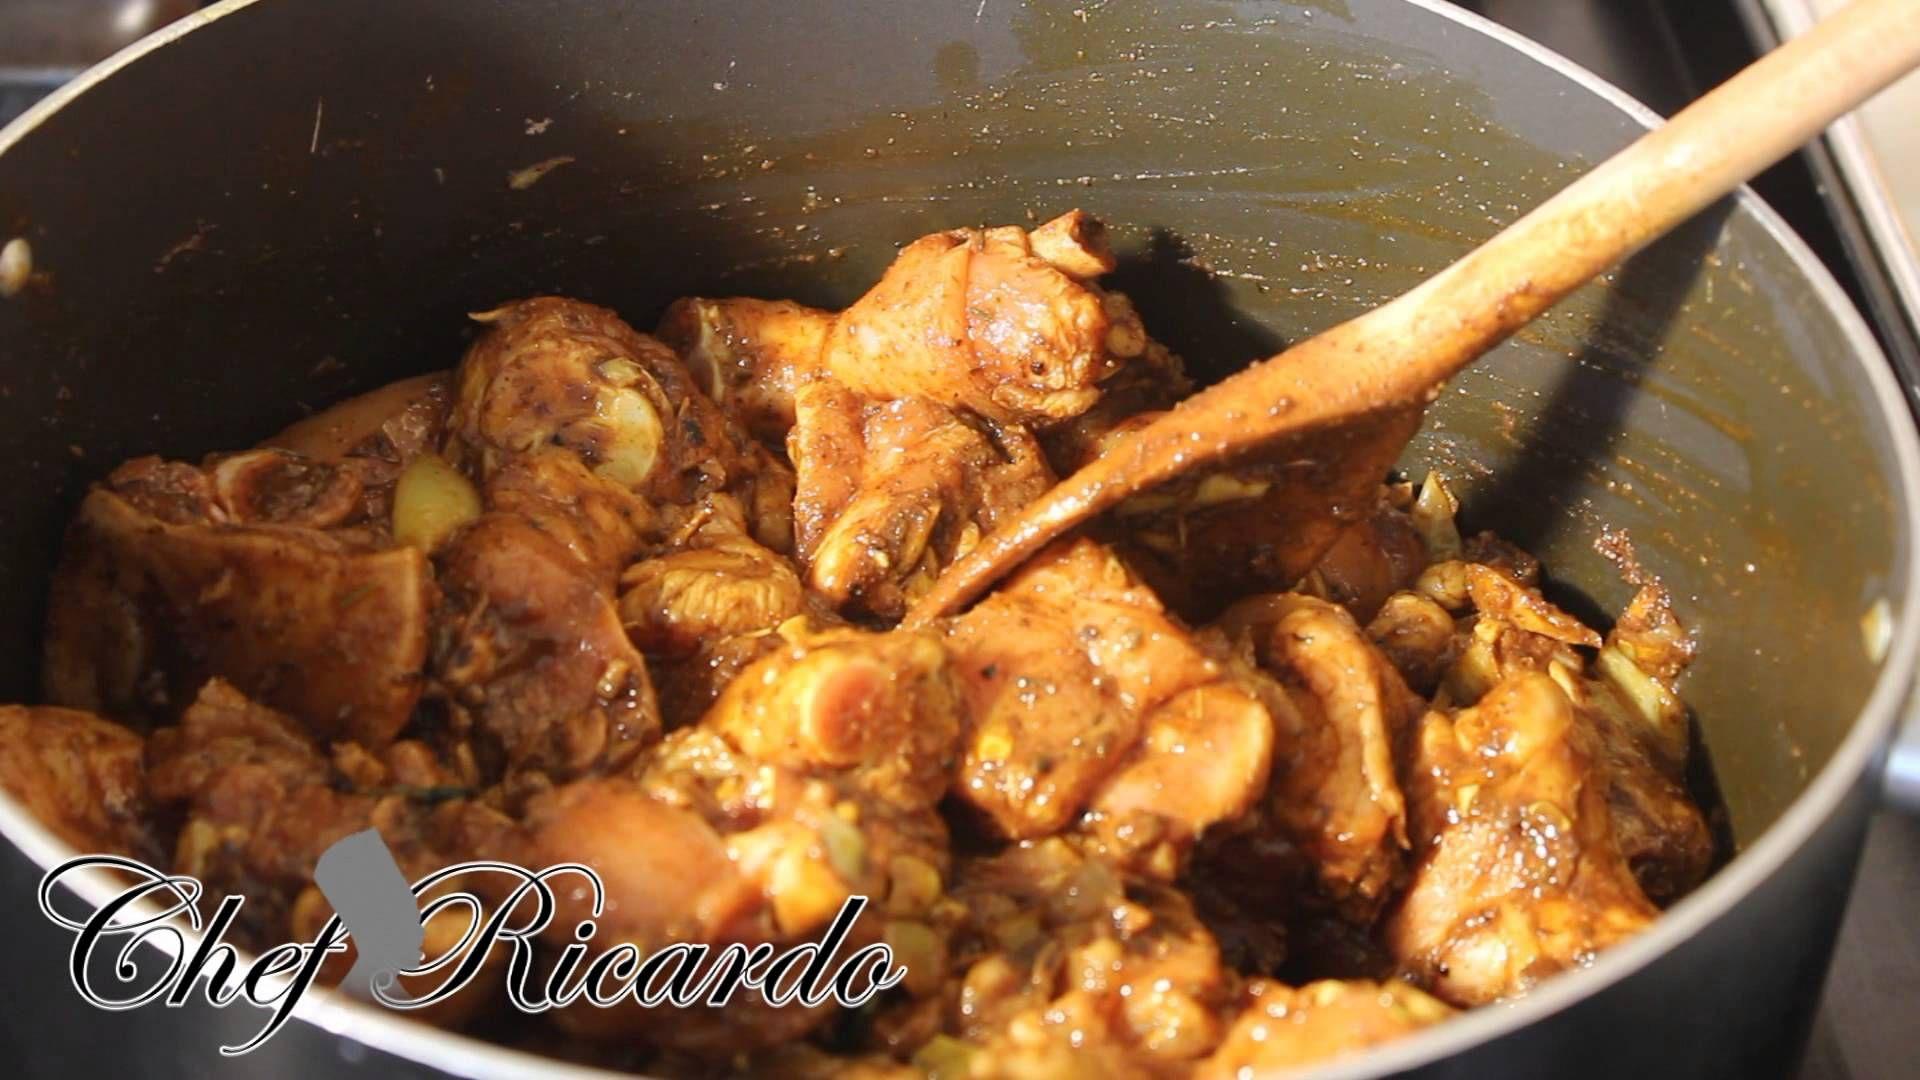 Caribbean Twist Curry Chicken Recipe From Chef Ricardo Cooking Curry Chicken Curry Chicken Recipes Chicken Recipes